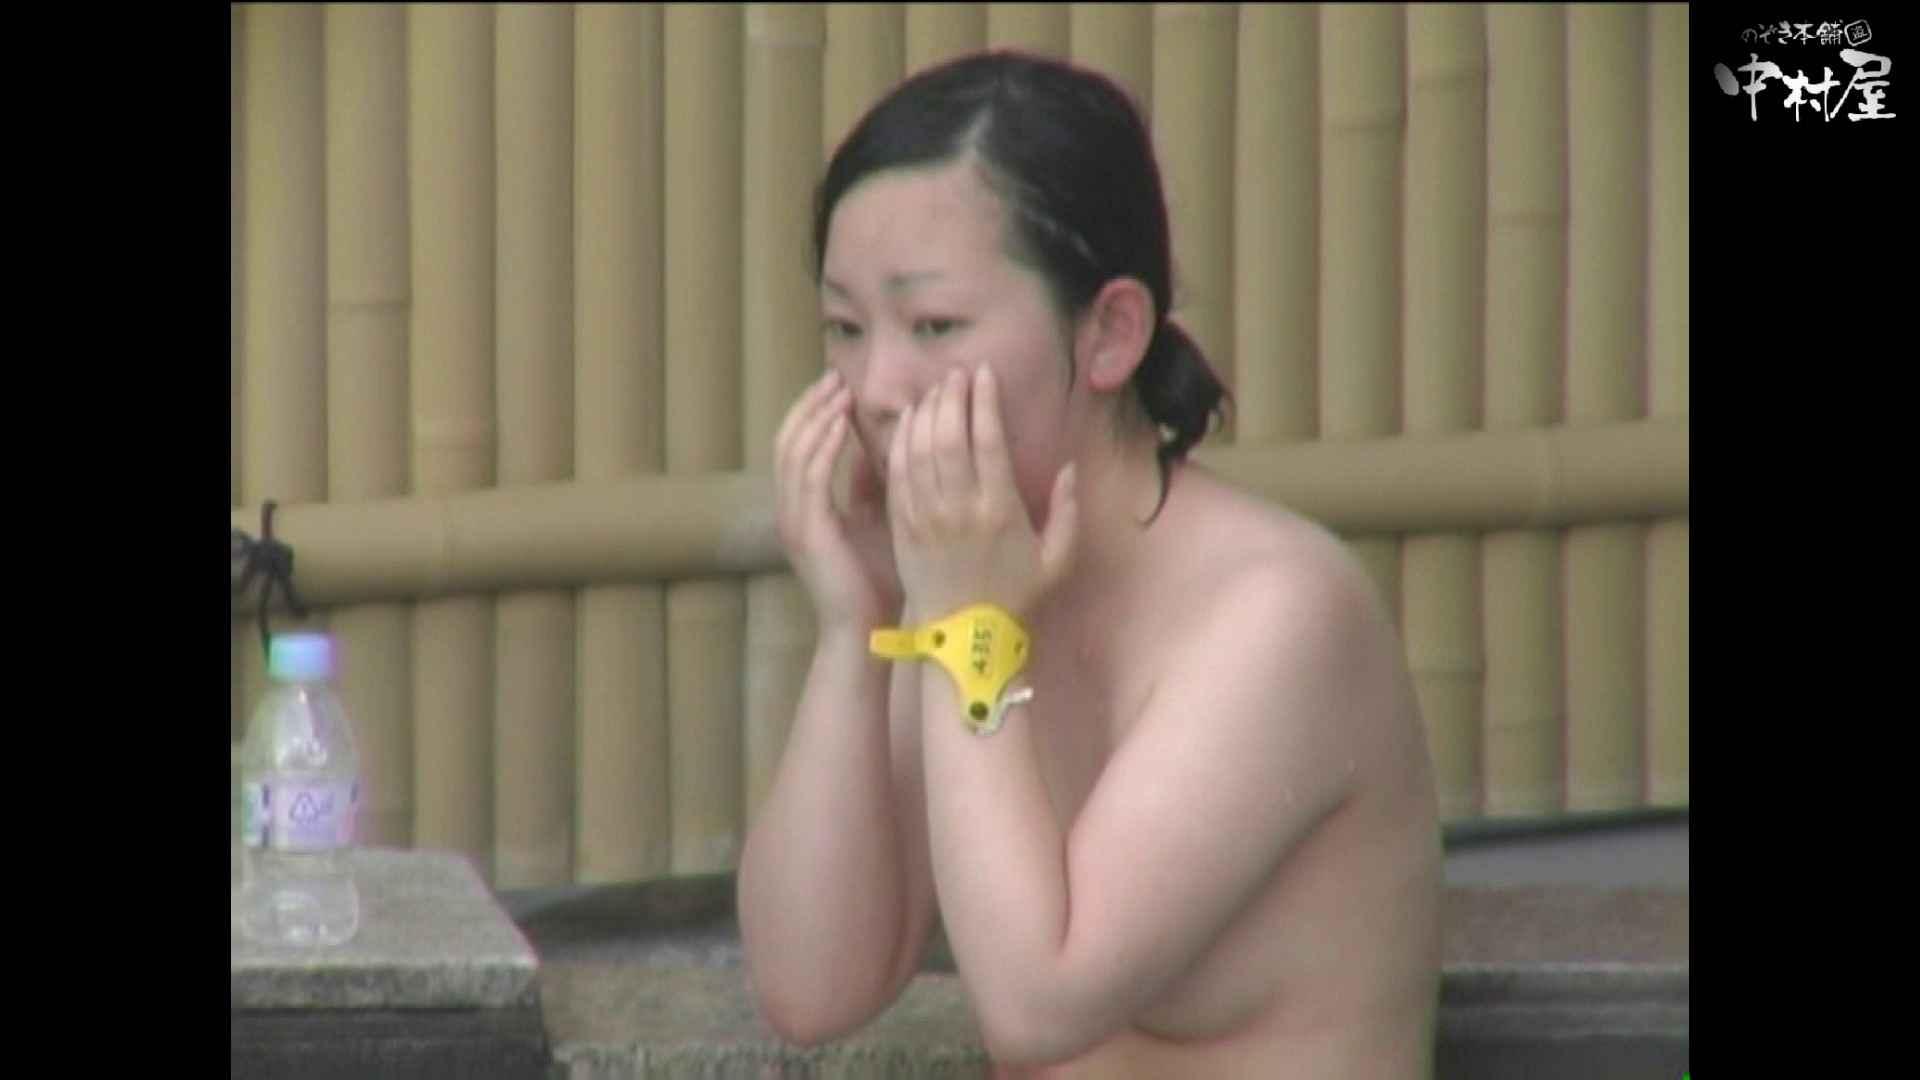 Aquaな露天風呂Vol.892 盗撮 性交動画流出 39連発 38